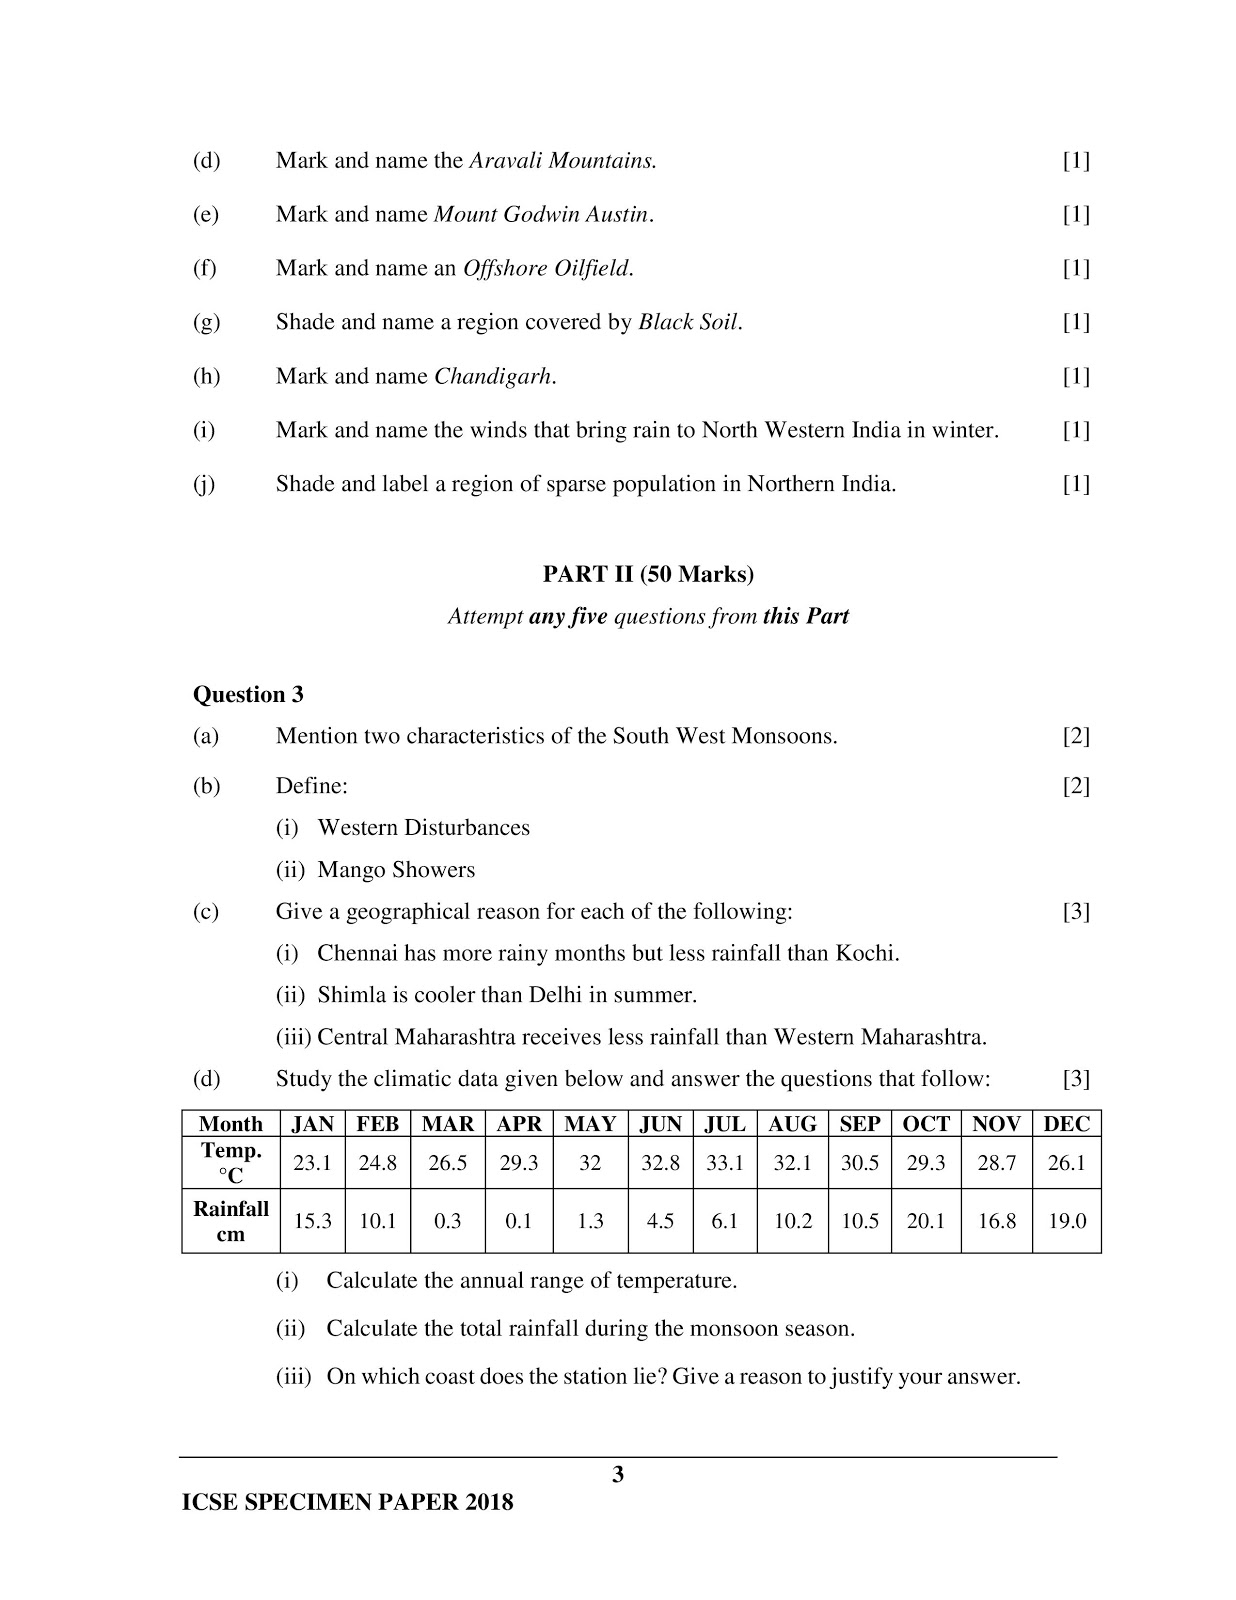 icse 2018 class 10th geography H.C.G Paper 2 specimen question paper